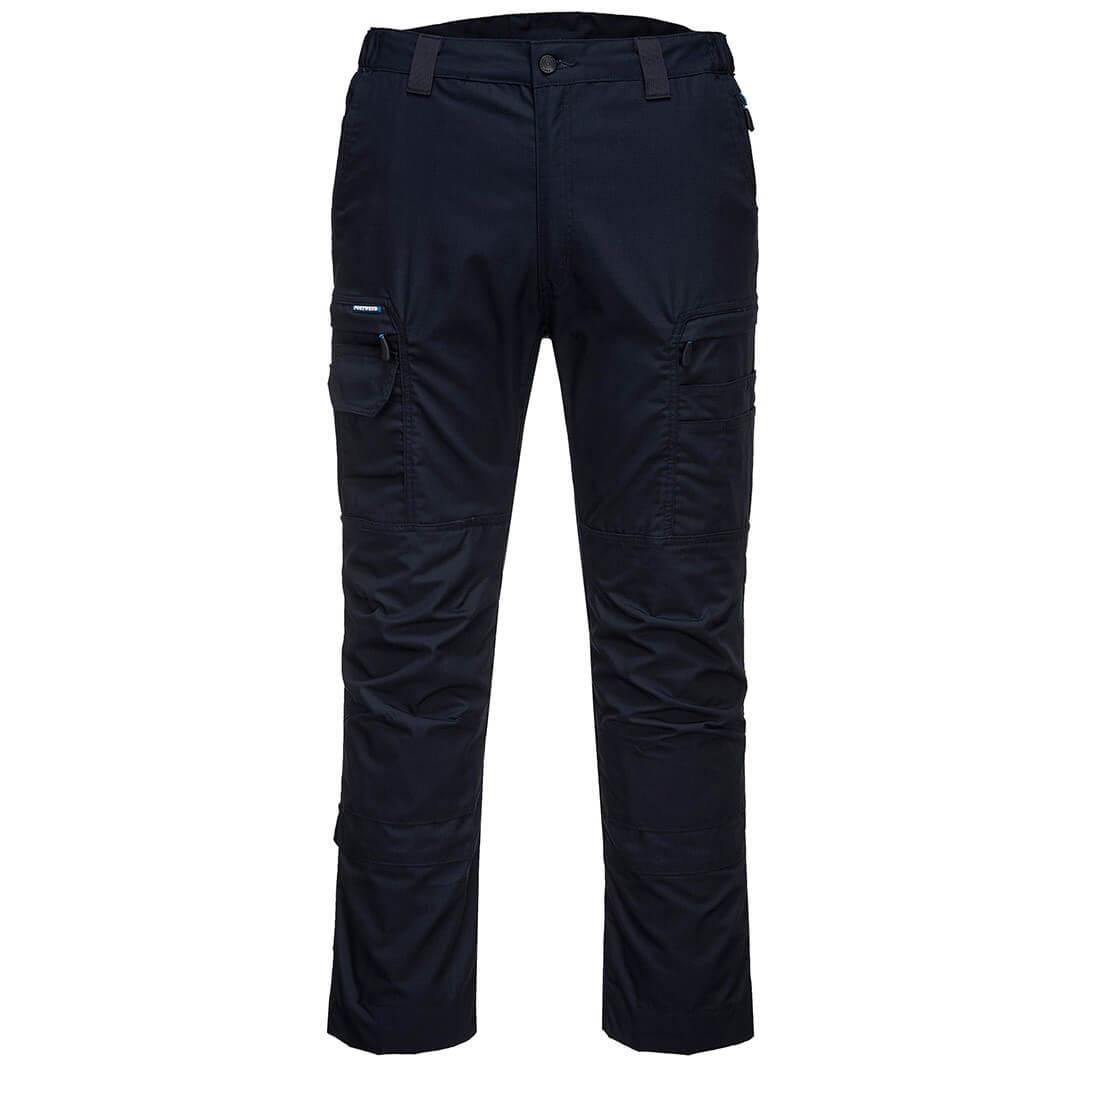 Pantaloni Ripstop KX3 - Imbracaminte de protectie